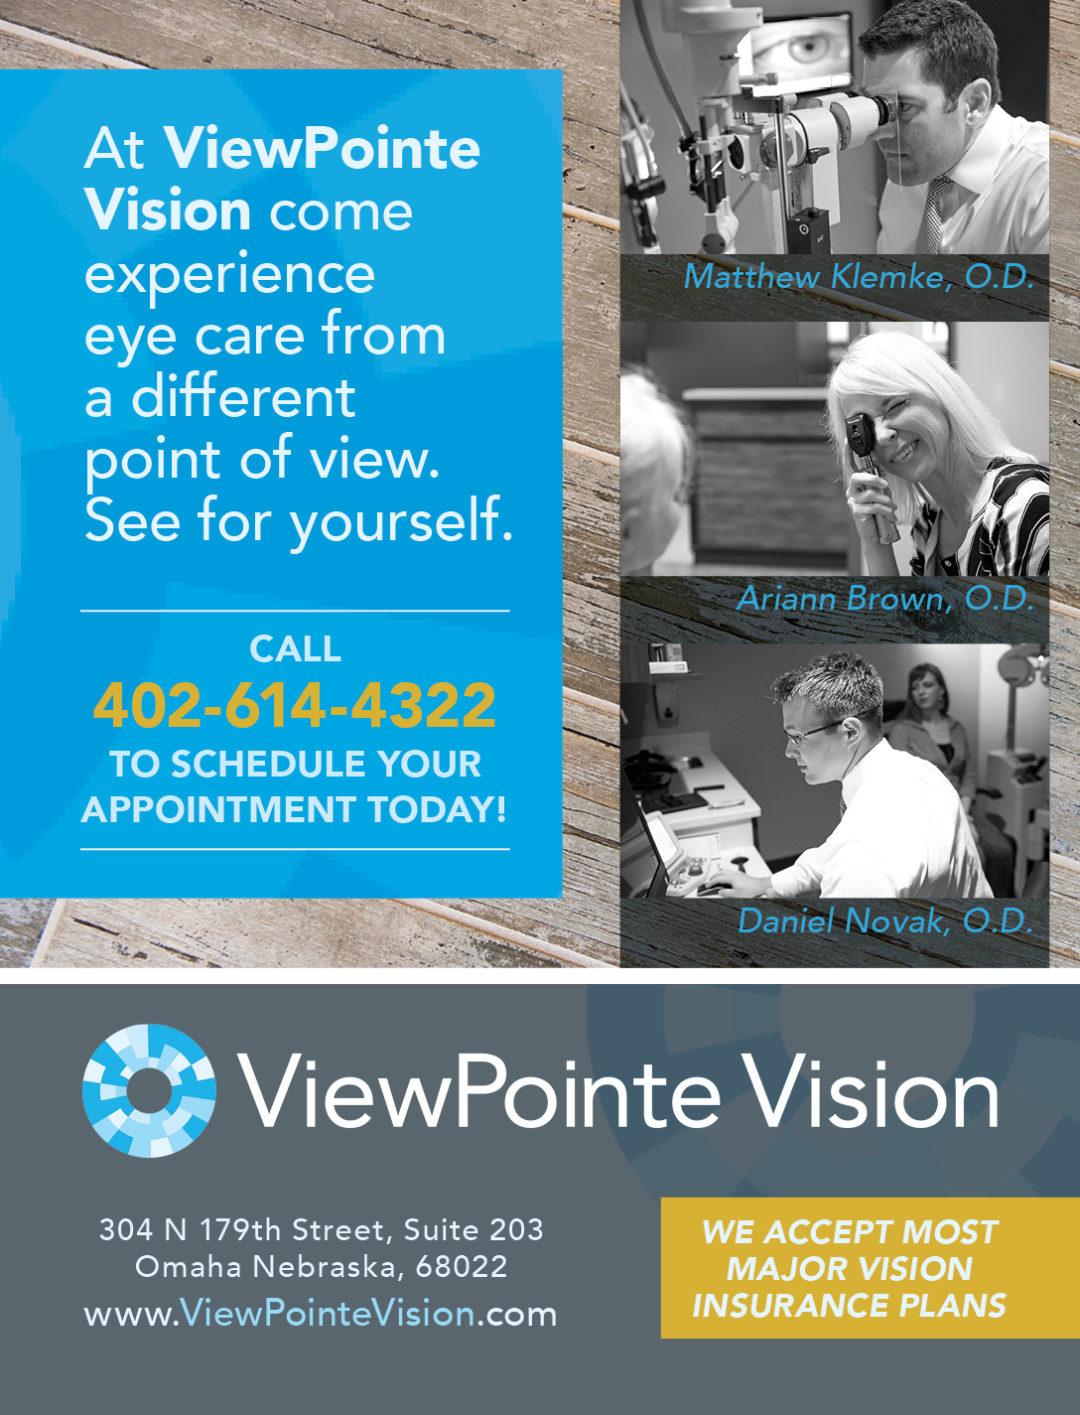 ViewPointe Vision Ad